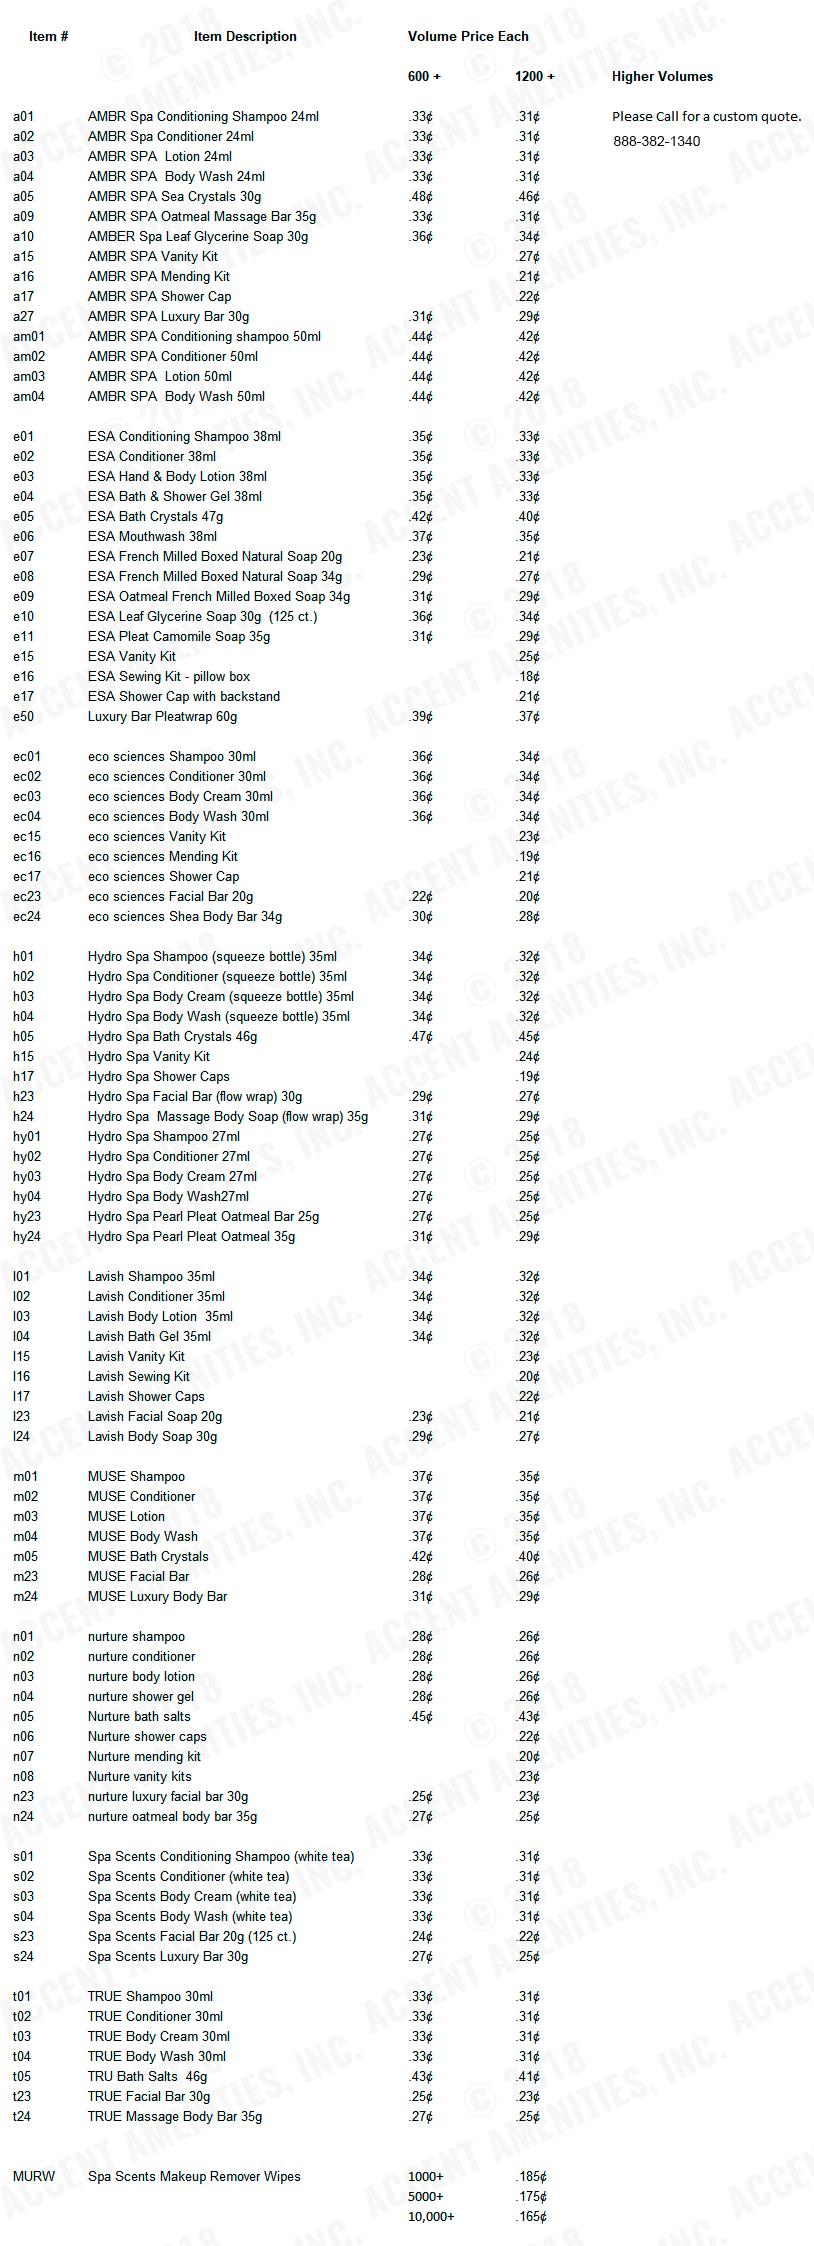 Volume Pricing